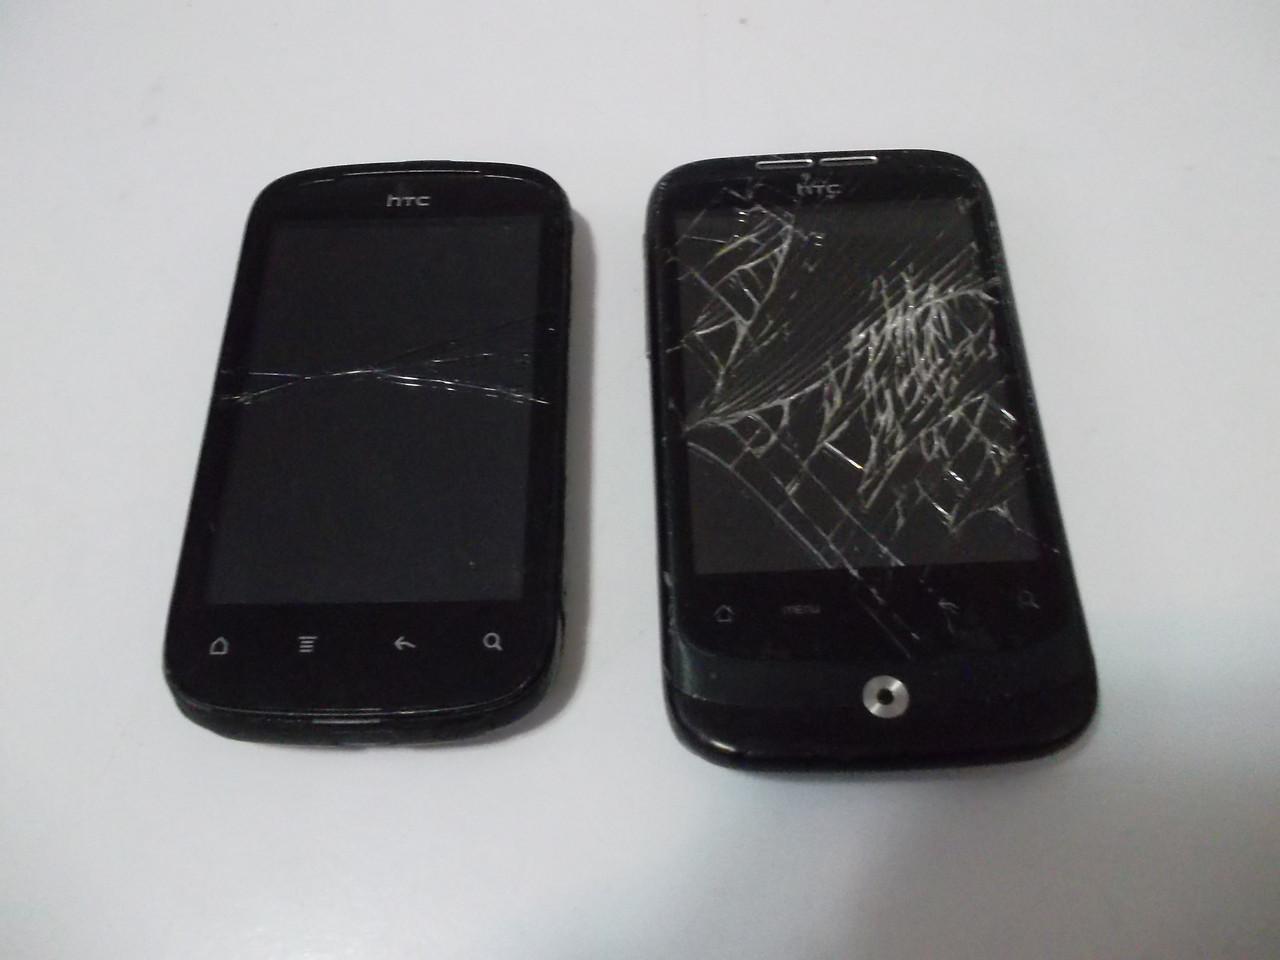 HTC desire A3333 и HTC Explorer №3640 на запчасти